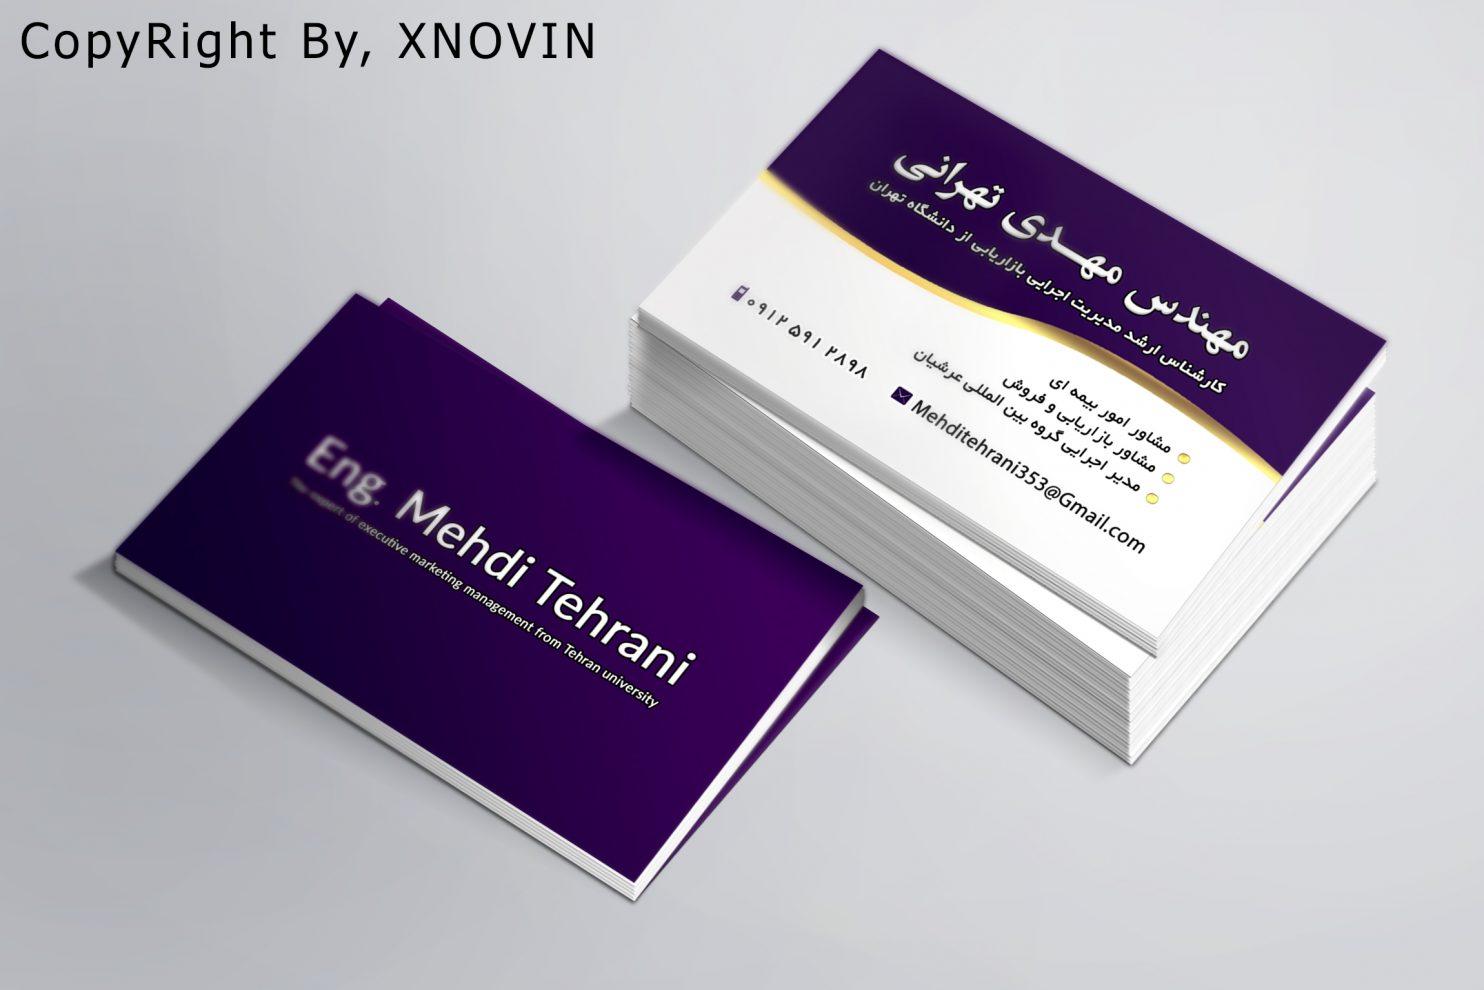 CardVisit Tehrani 1484x990 - طراحی کارت ویزیت مهدی تهرانی